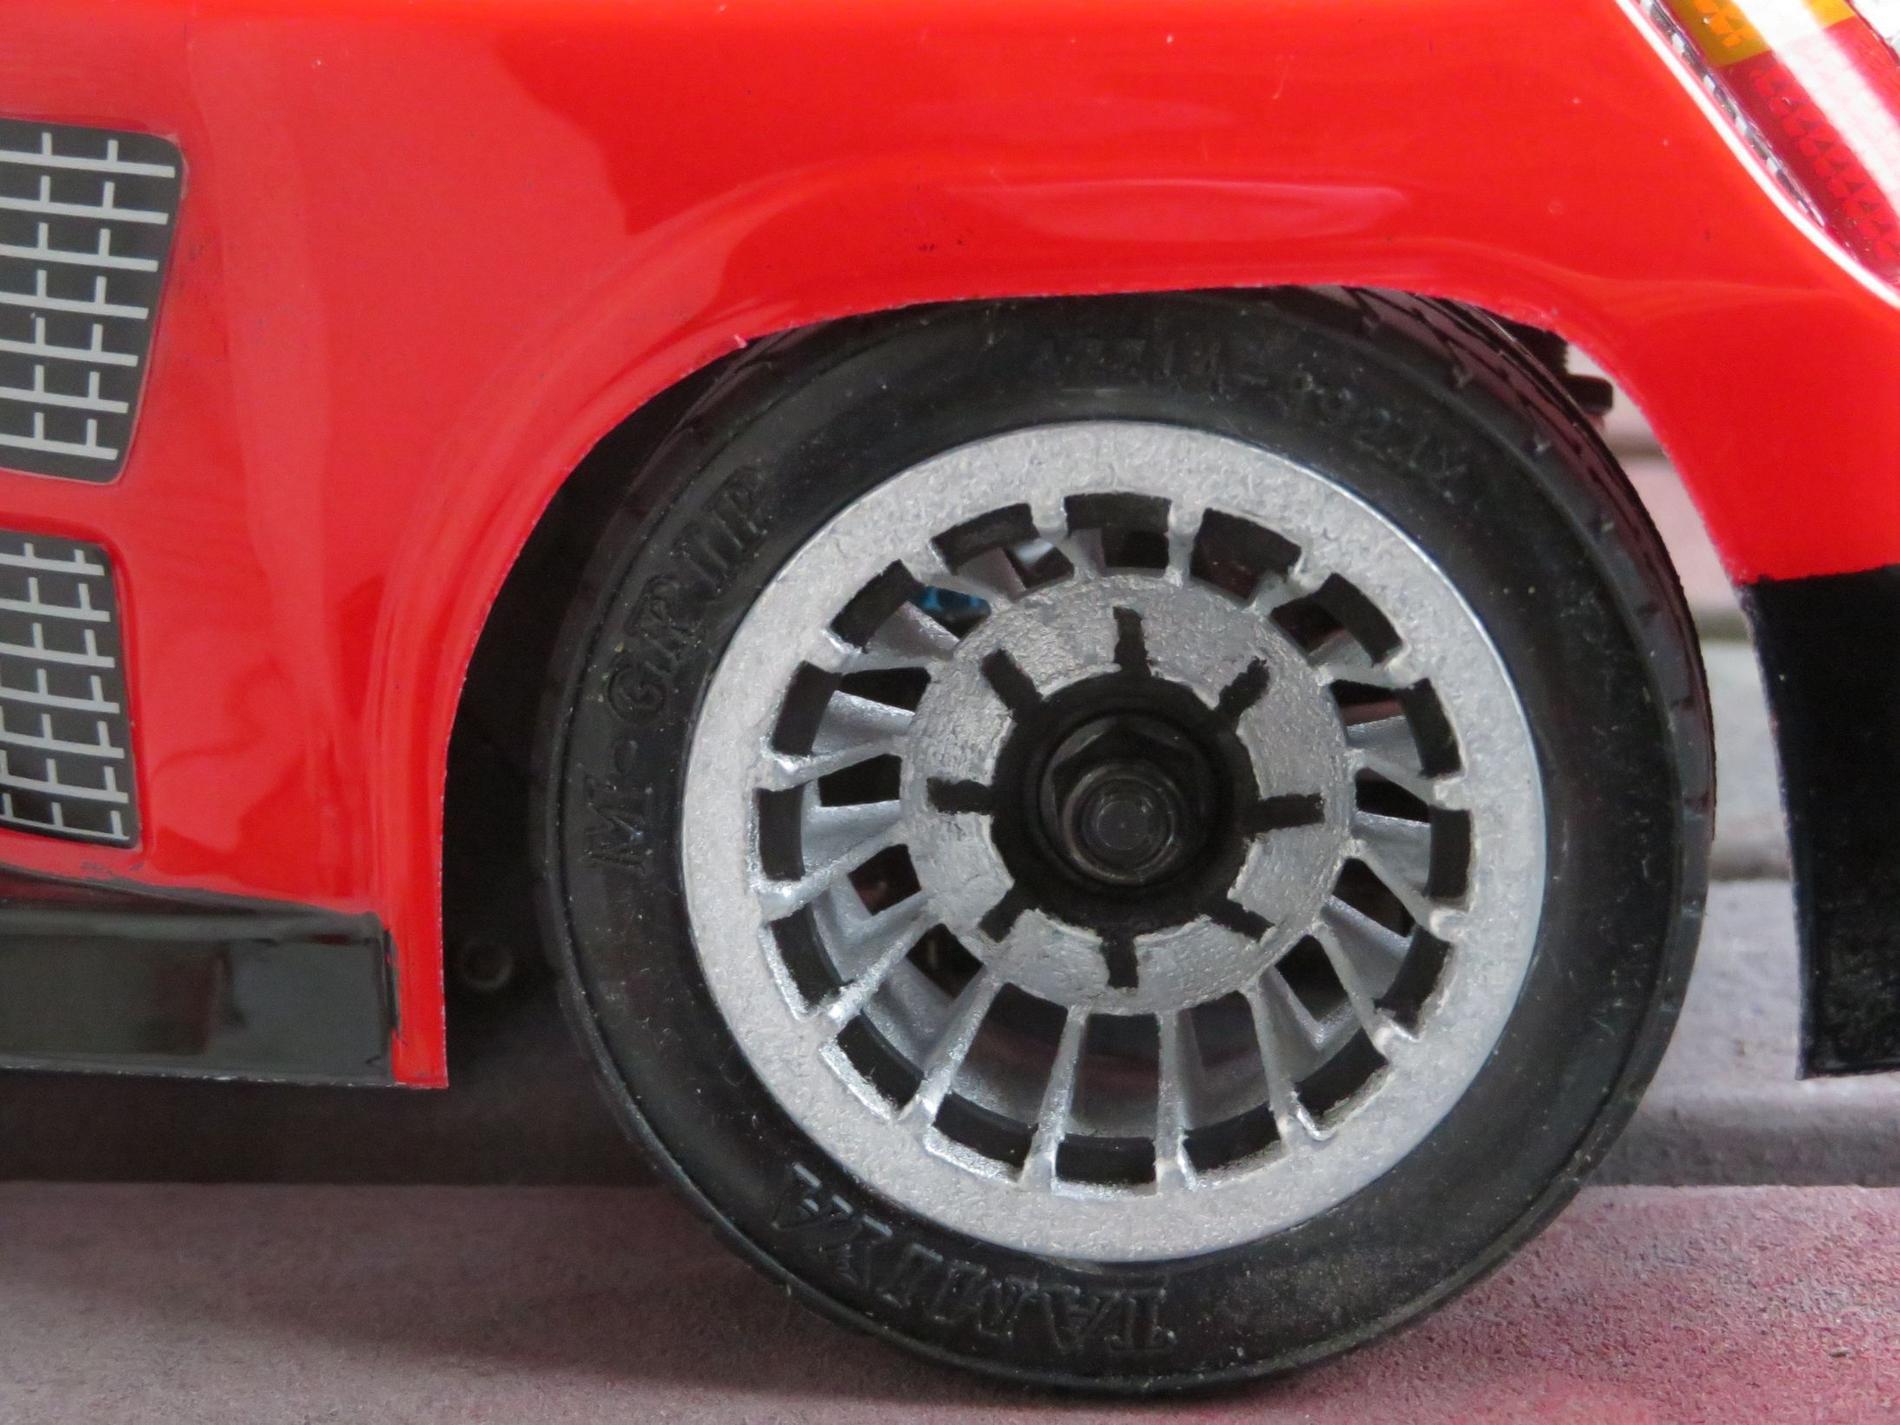 Tamiya Renault 5 Turbo - M08 Concept C9f73235e892fc0457d7430e070dcfde